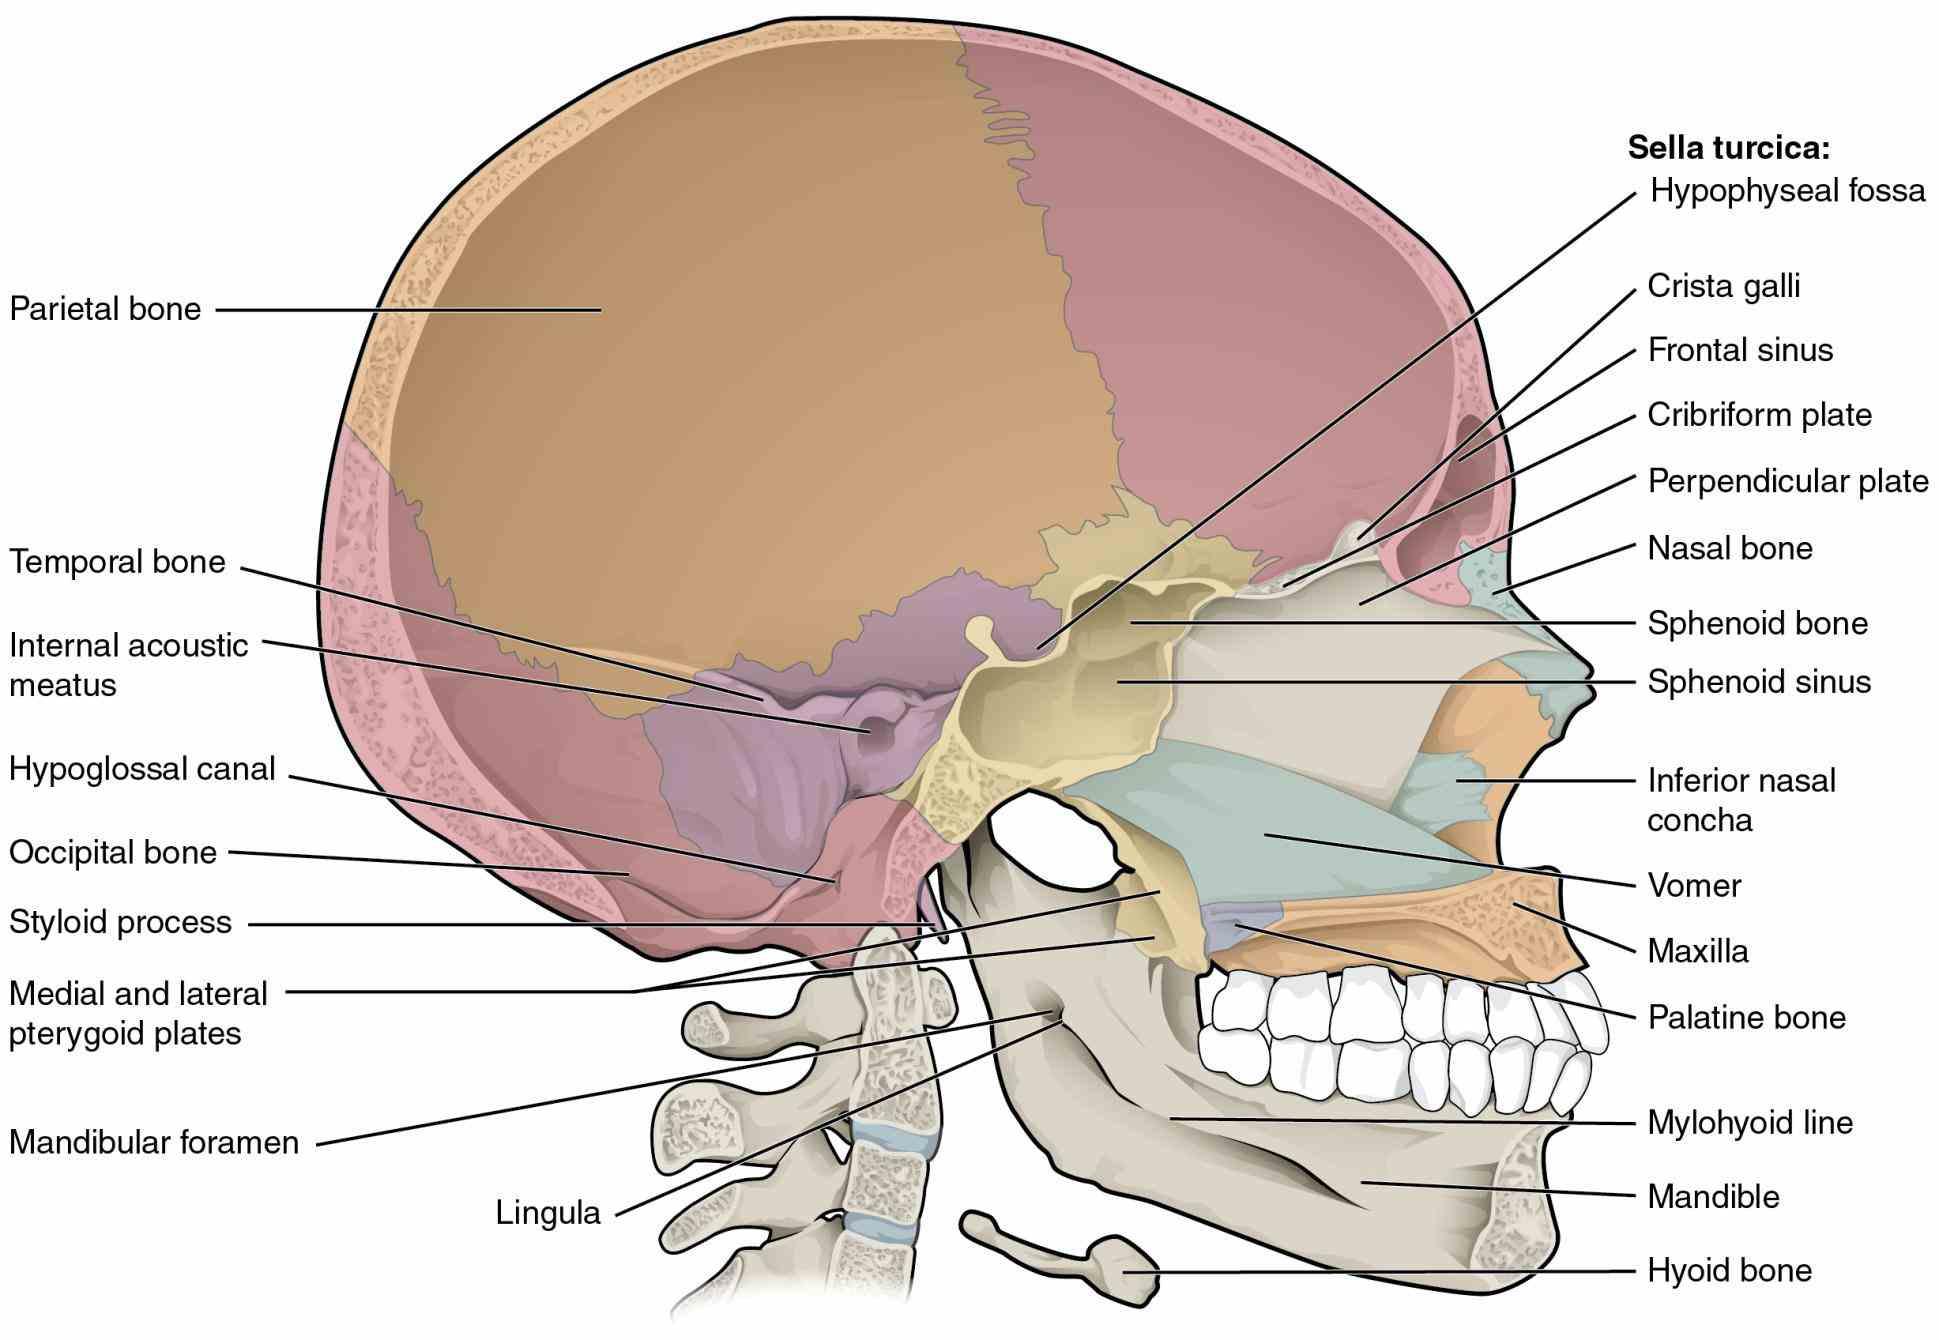 those cranium which subdivided skullcap known as calvarium and movements Anatomy The Bones Of The Skull of these bones